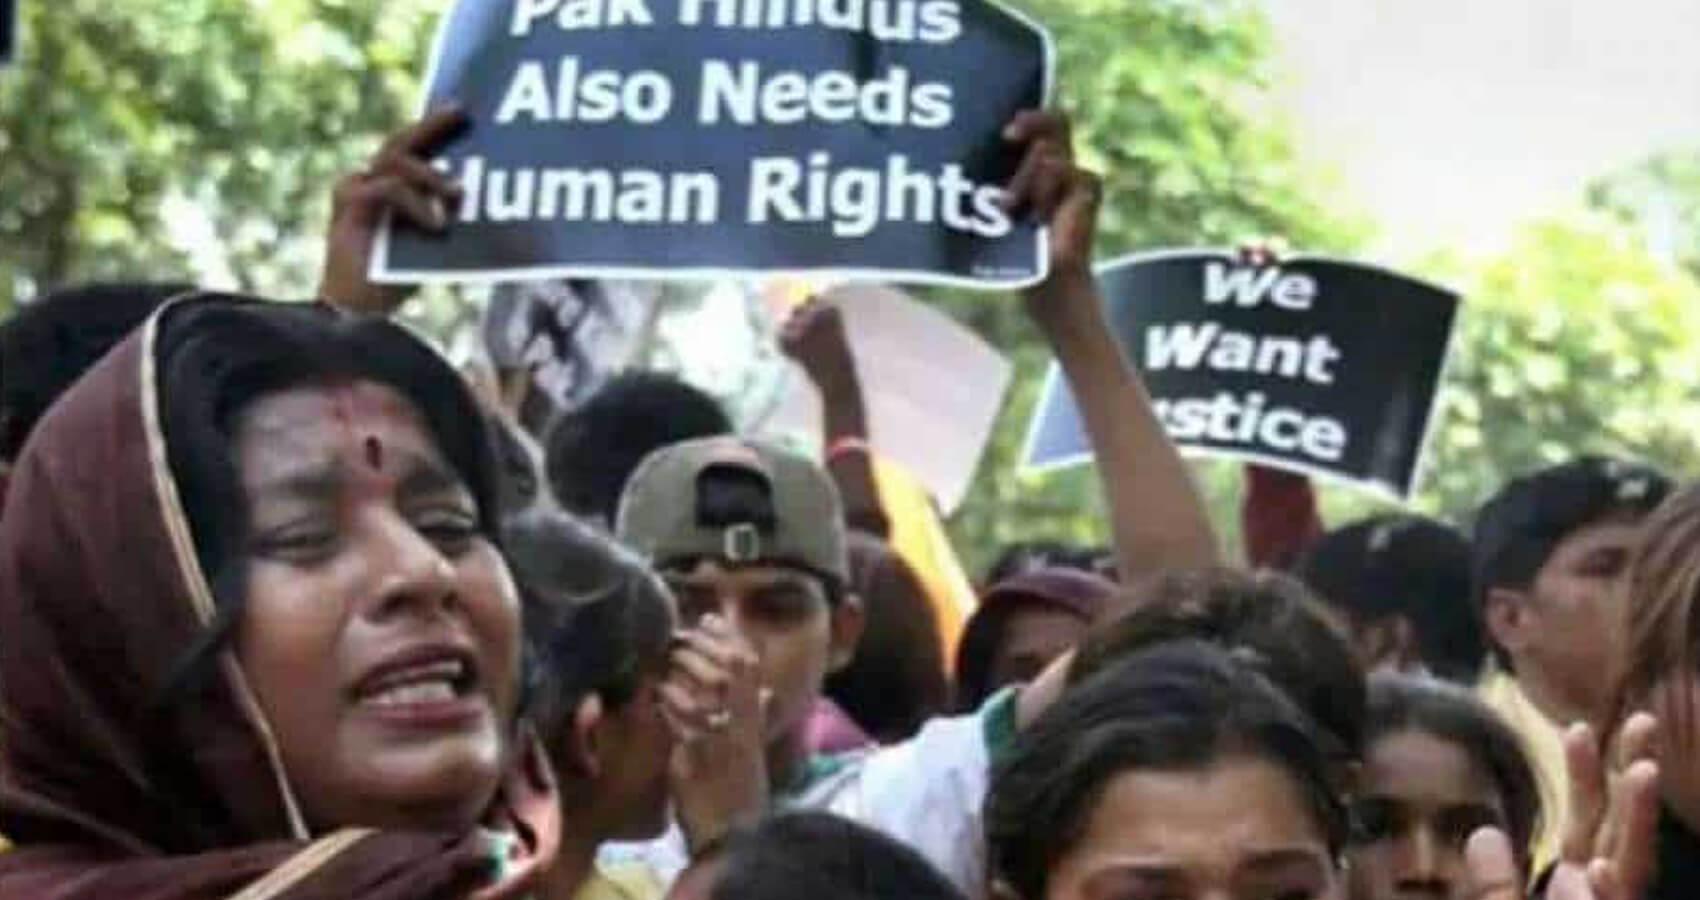 Pakistan Markets Hindu, Christian Women as 'Concubines': U.S. Official Says